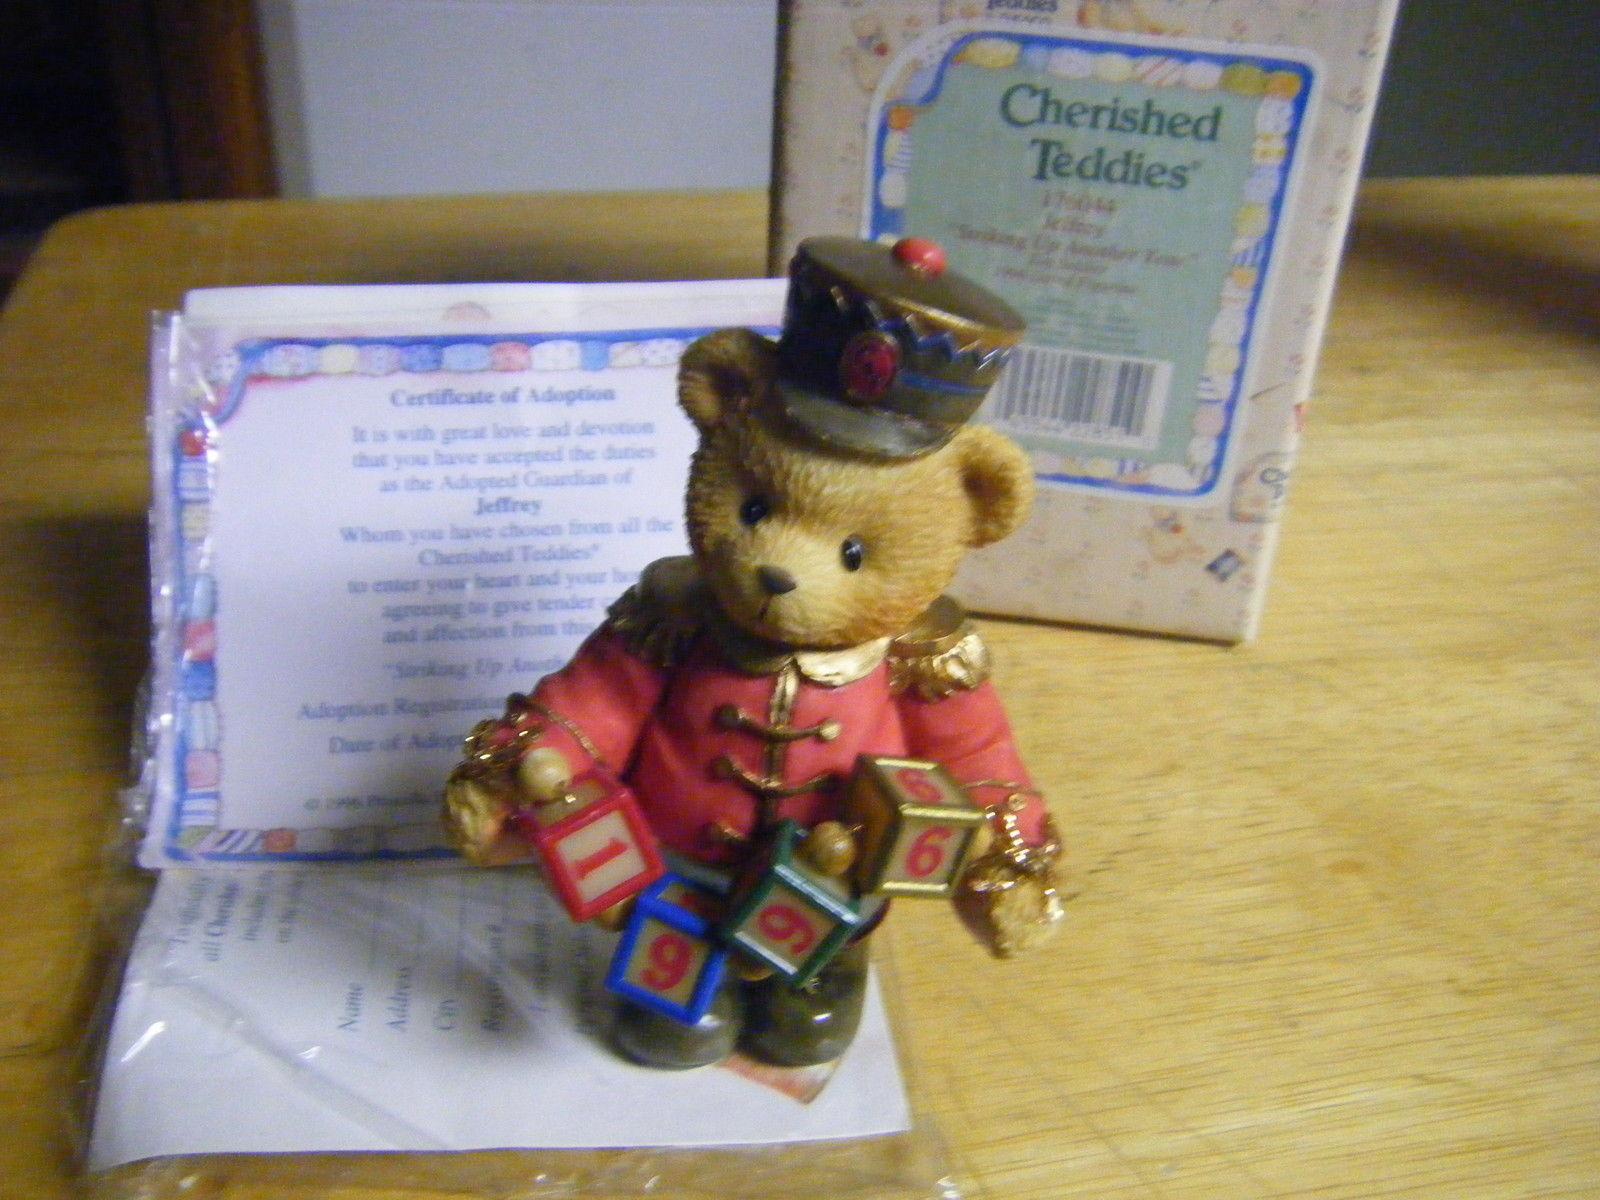 Toy Soldier Bear Figurine Jeffrey Cherished Teddies Enesco 1996 P Hillman MIB  - $5.69